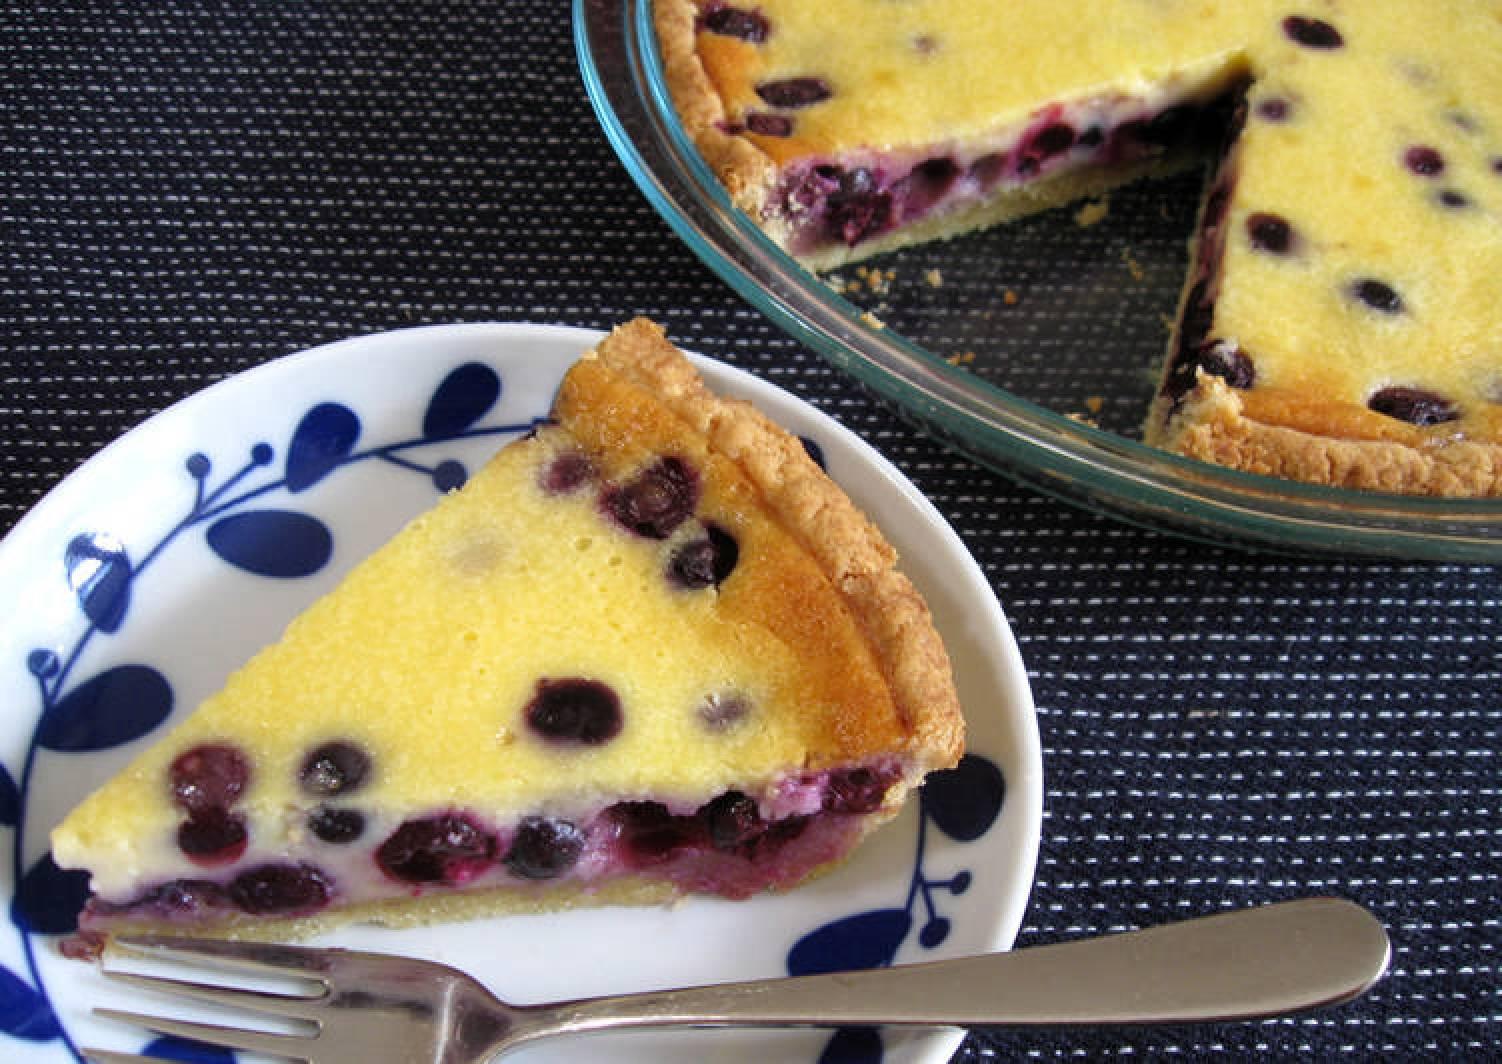 Blueberry & Sour Cream Pie